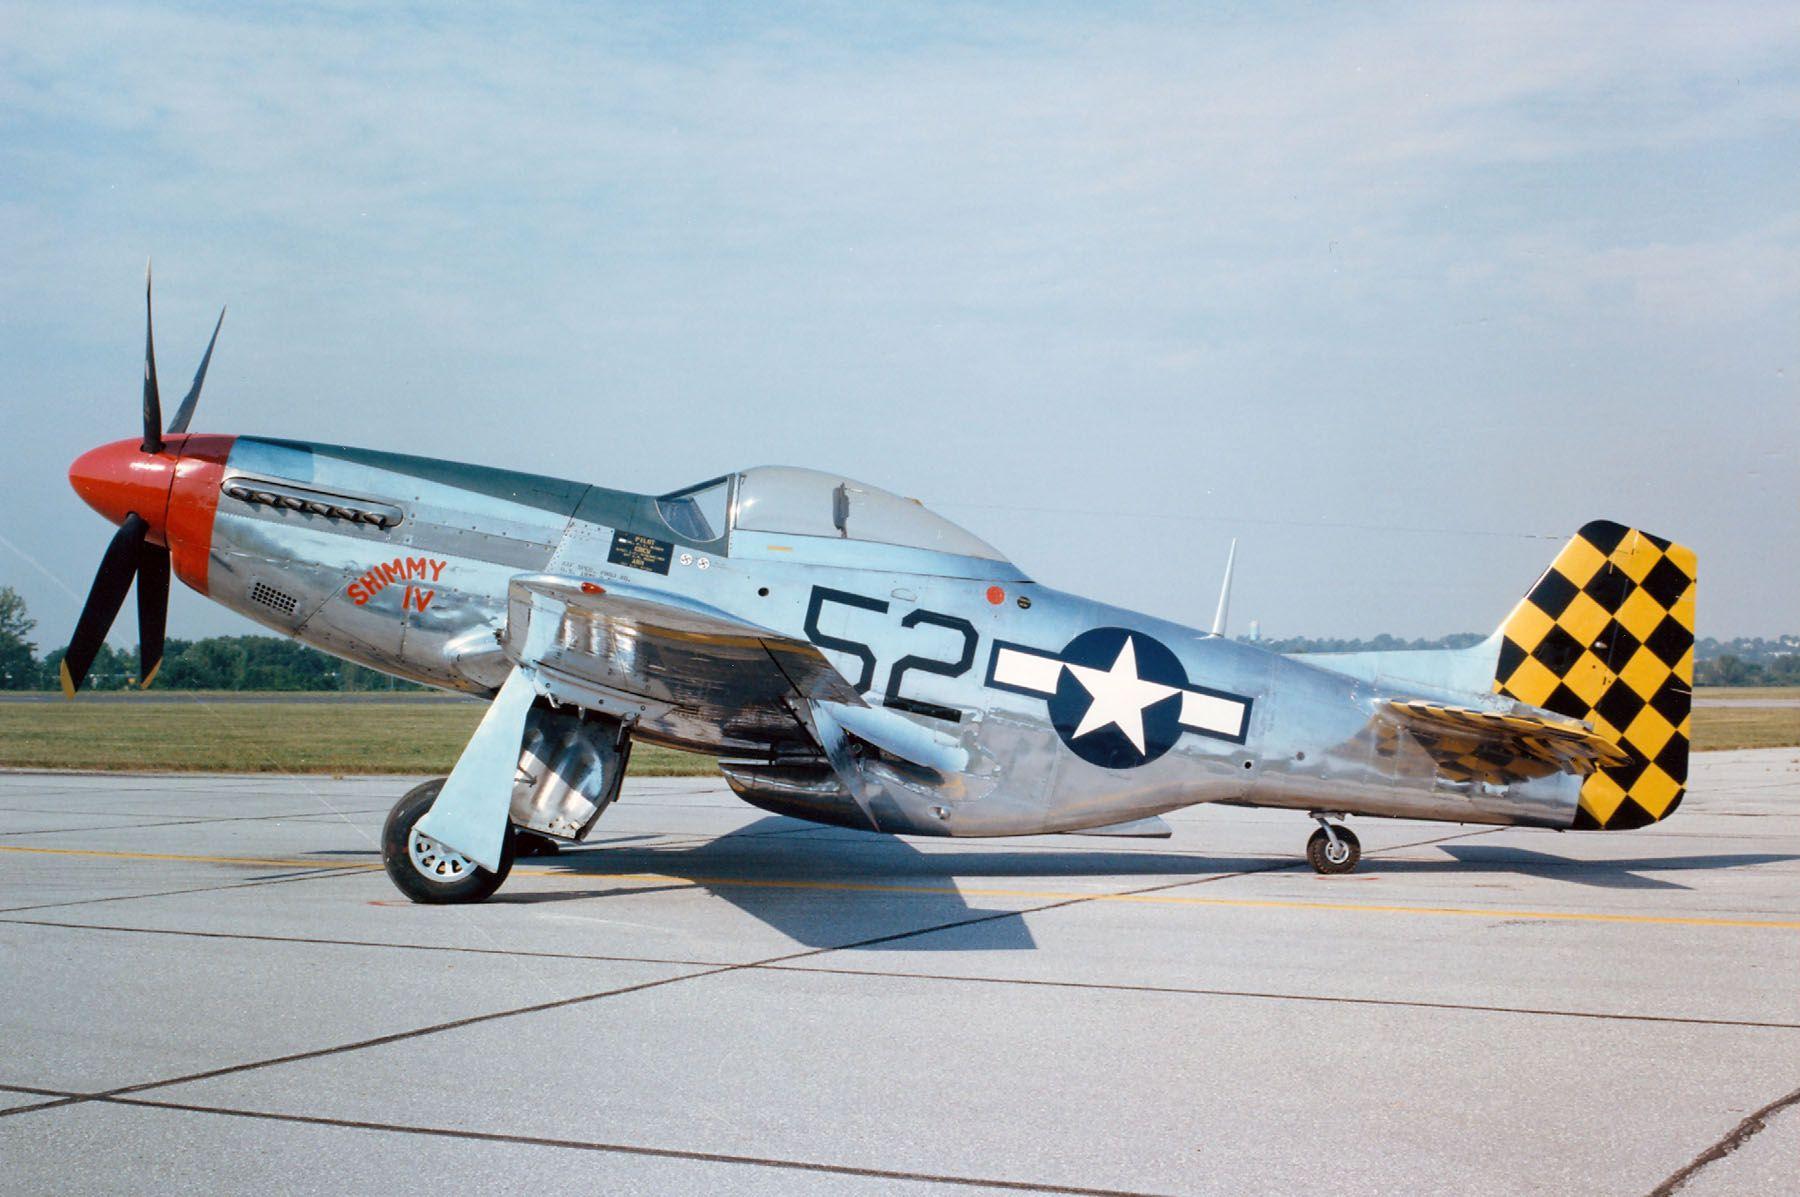 P 51 Mustang Plane Documentary